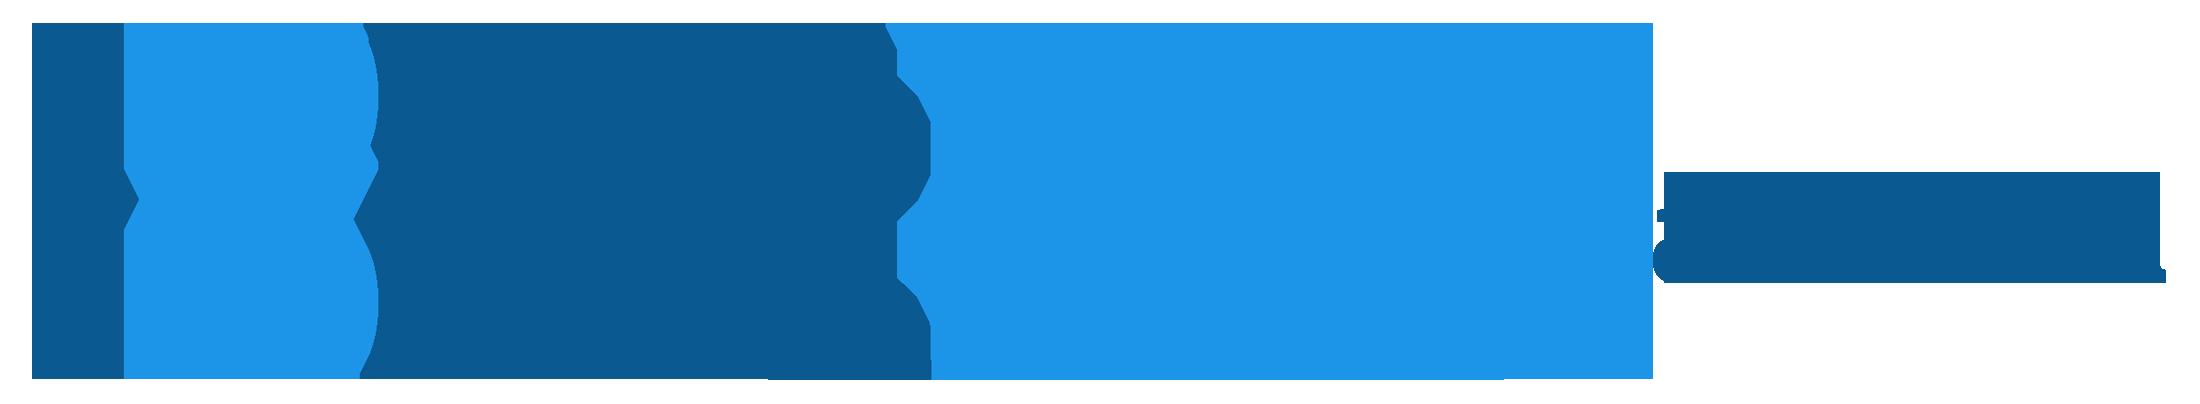 Logo BitBox Analítica 3b